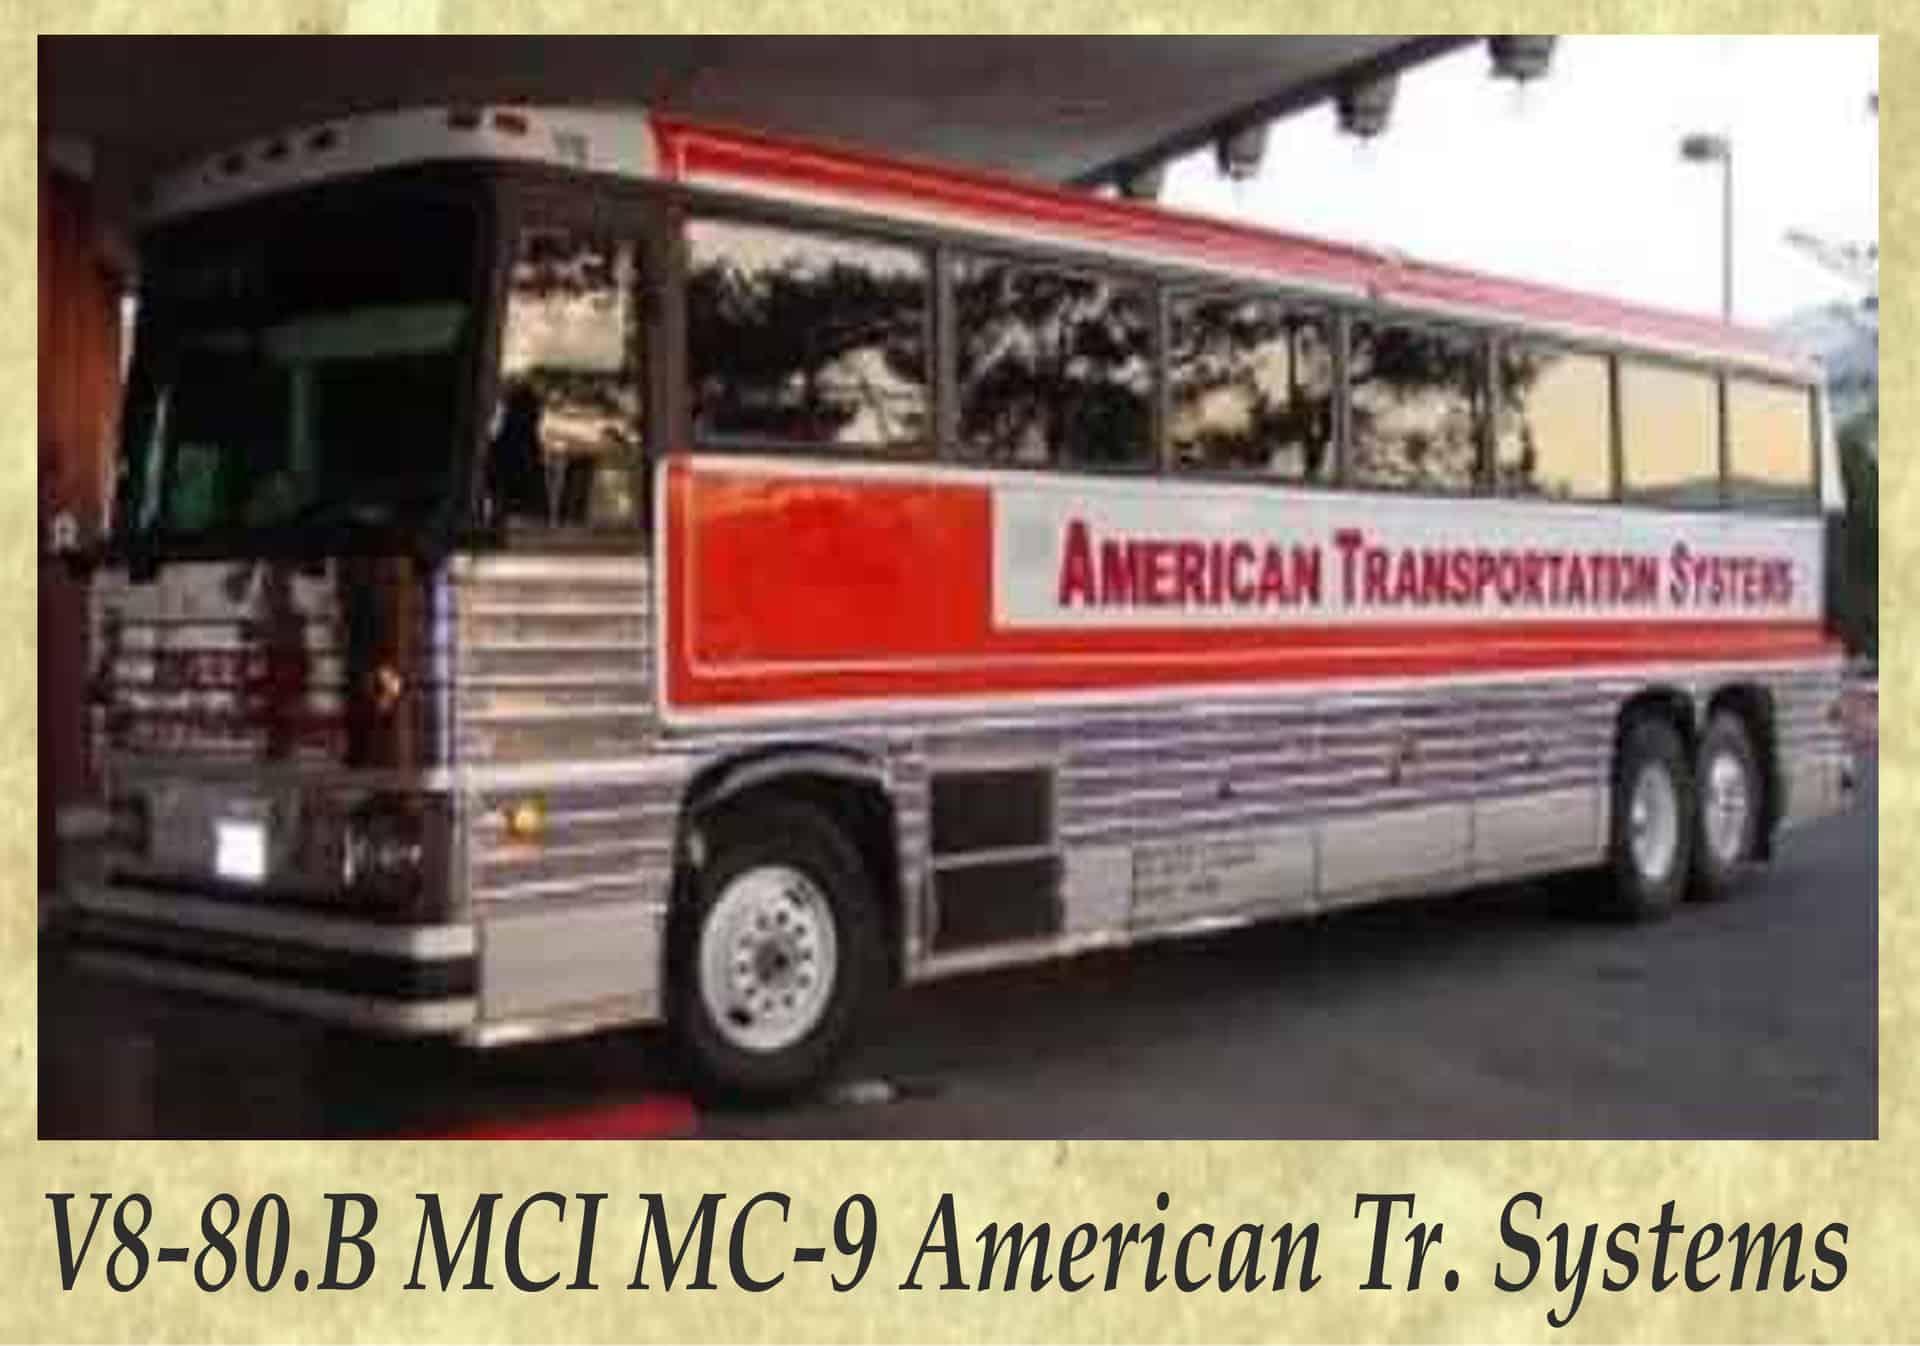 V8-80.B MCI MC-9 American Tr. Systems